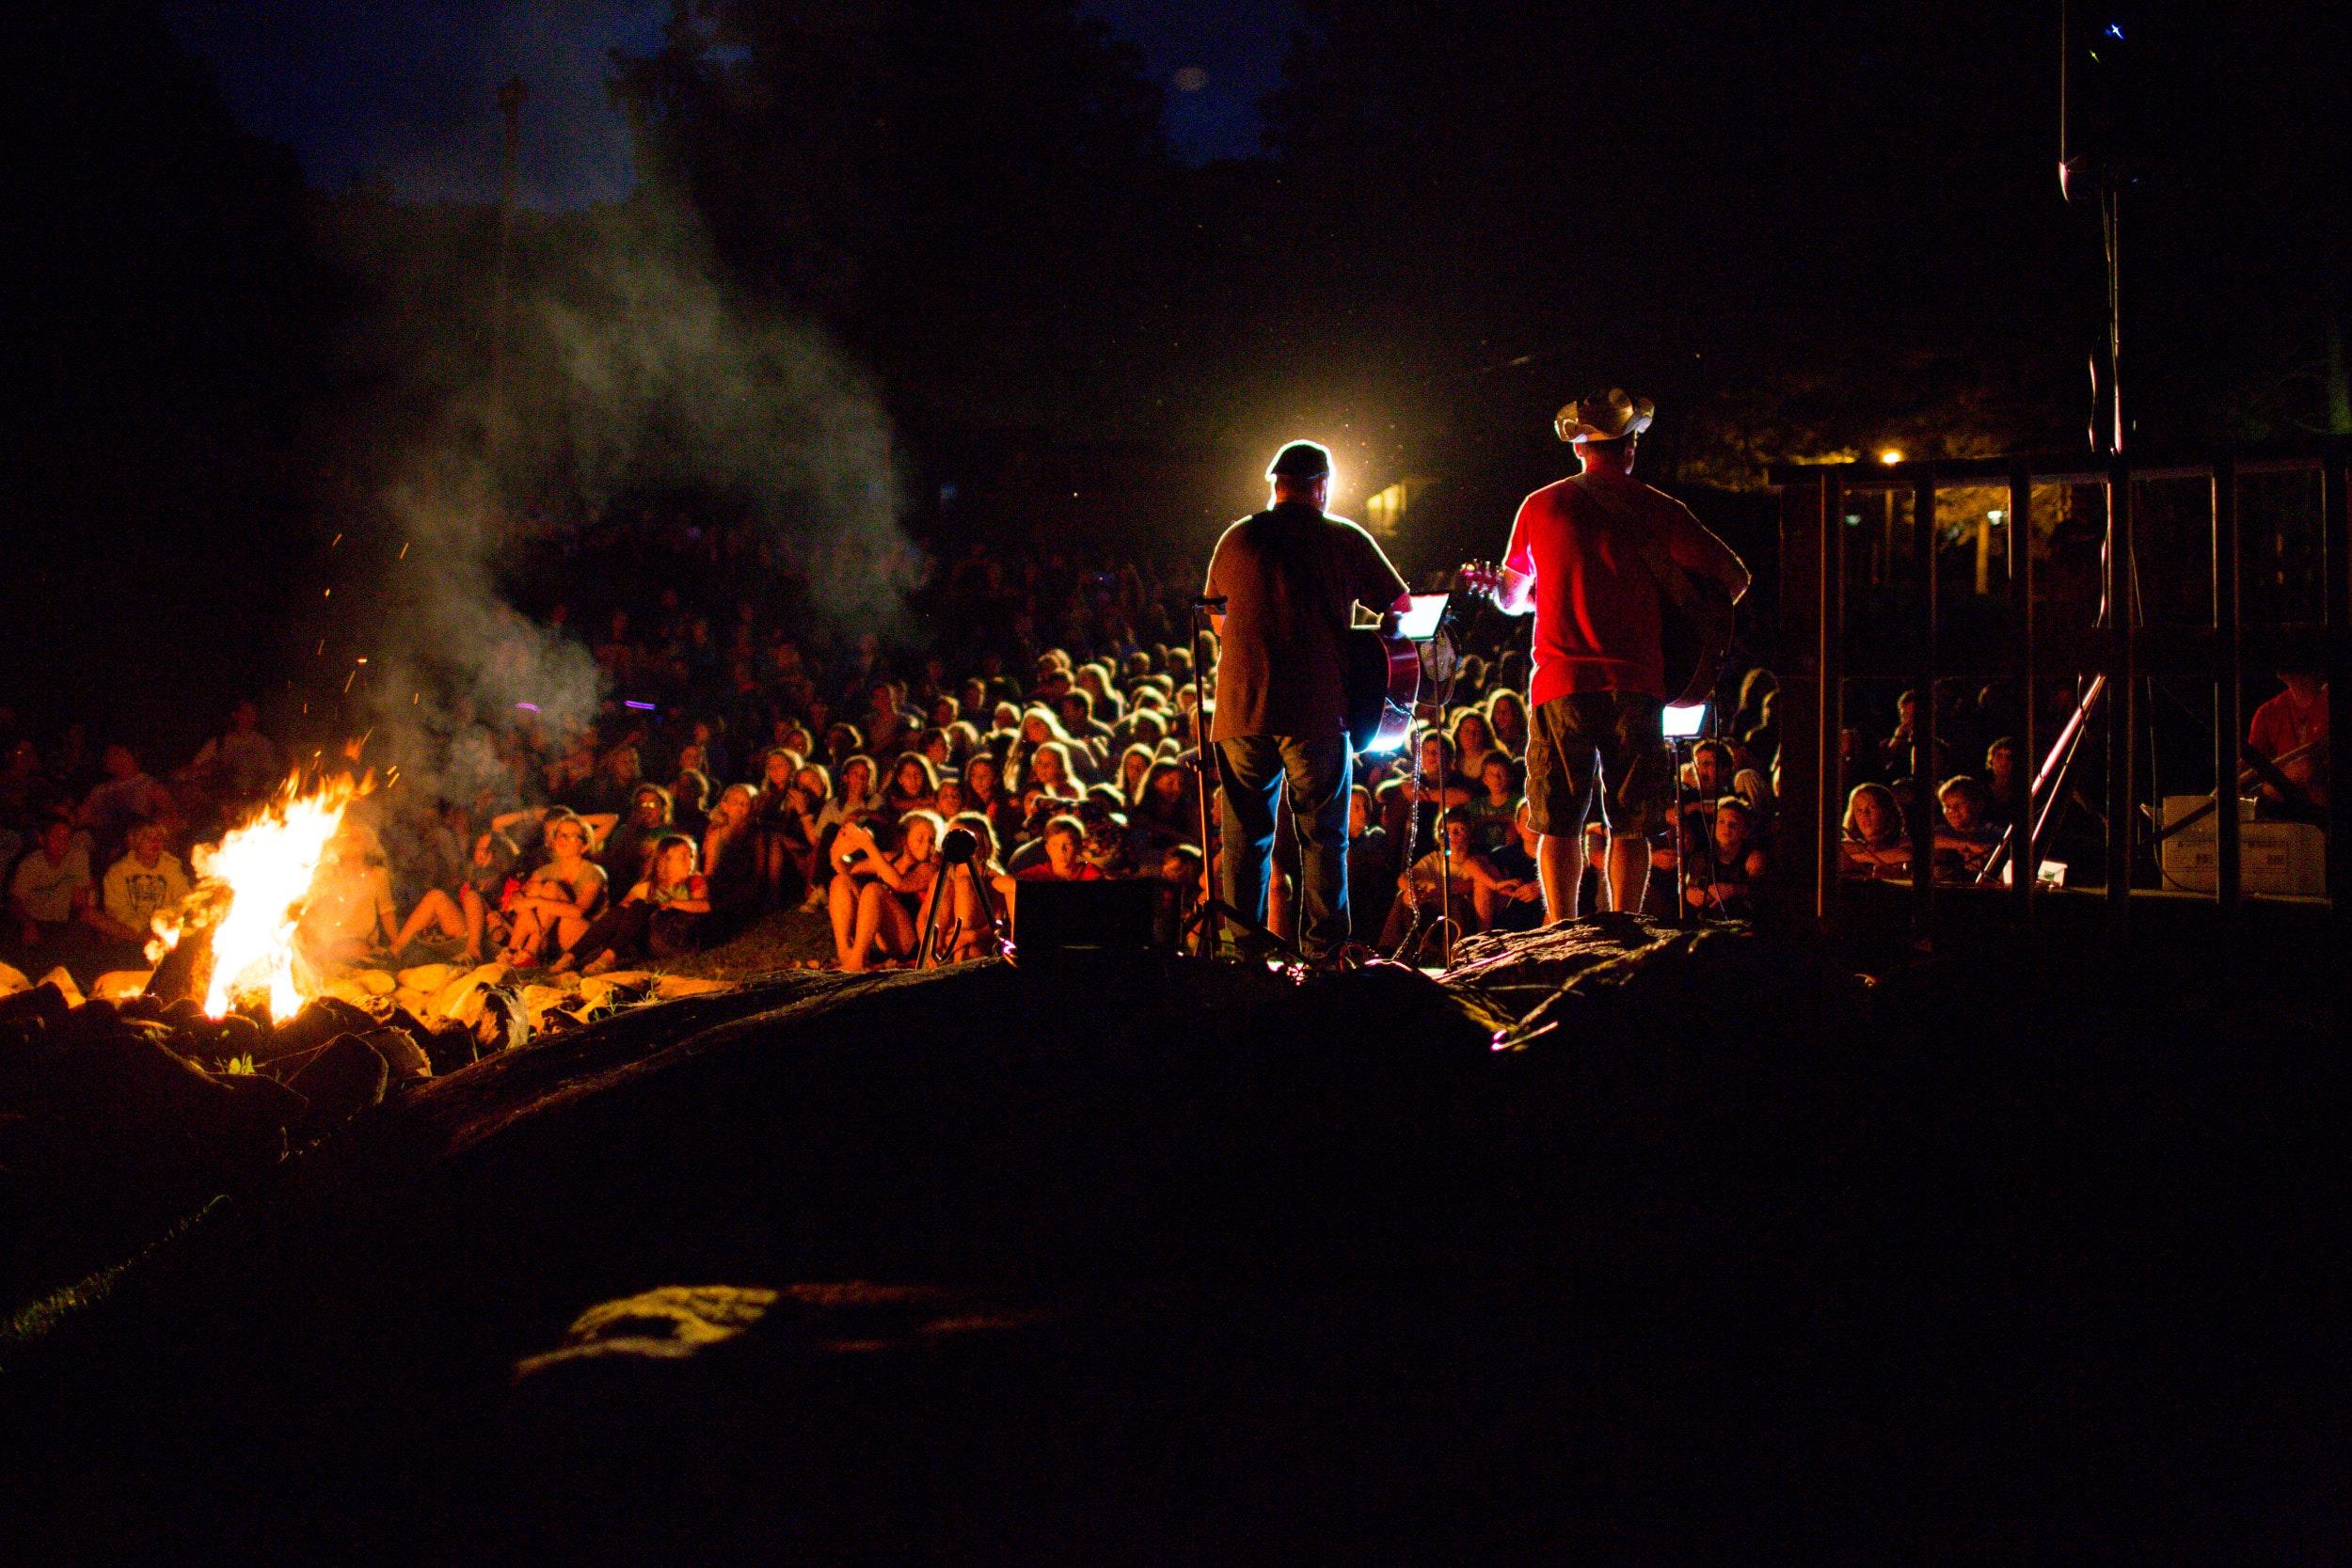 Final camp fire at highlander summer camp for boys and girls in north carolina.jpg?ixlib=rails 2.1